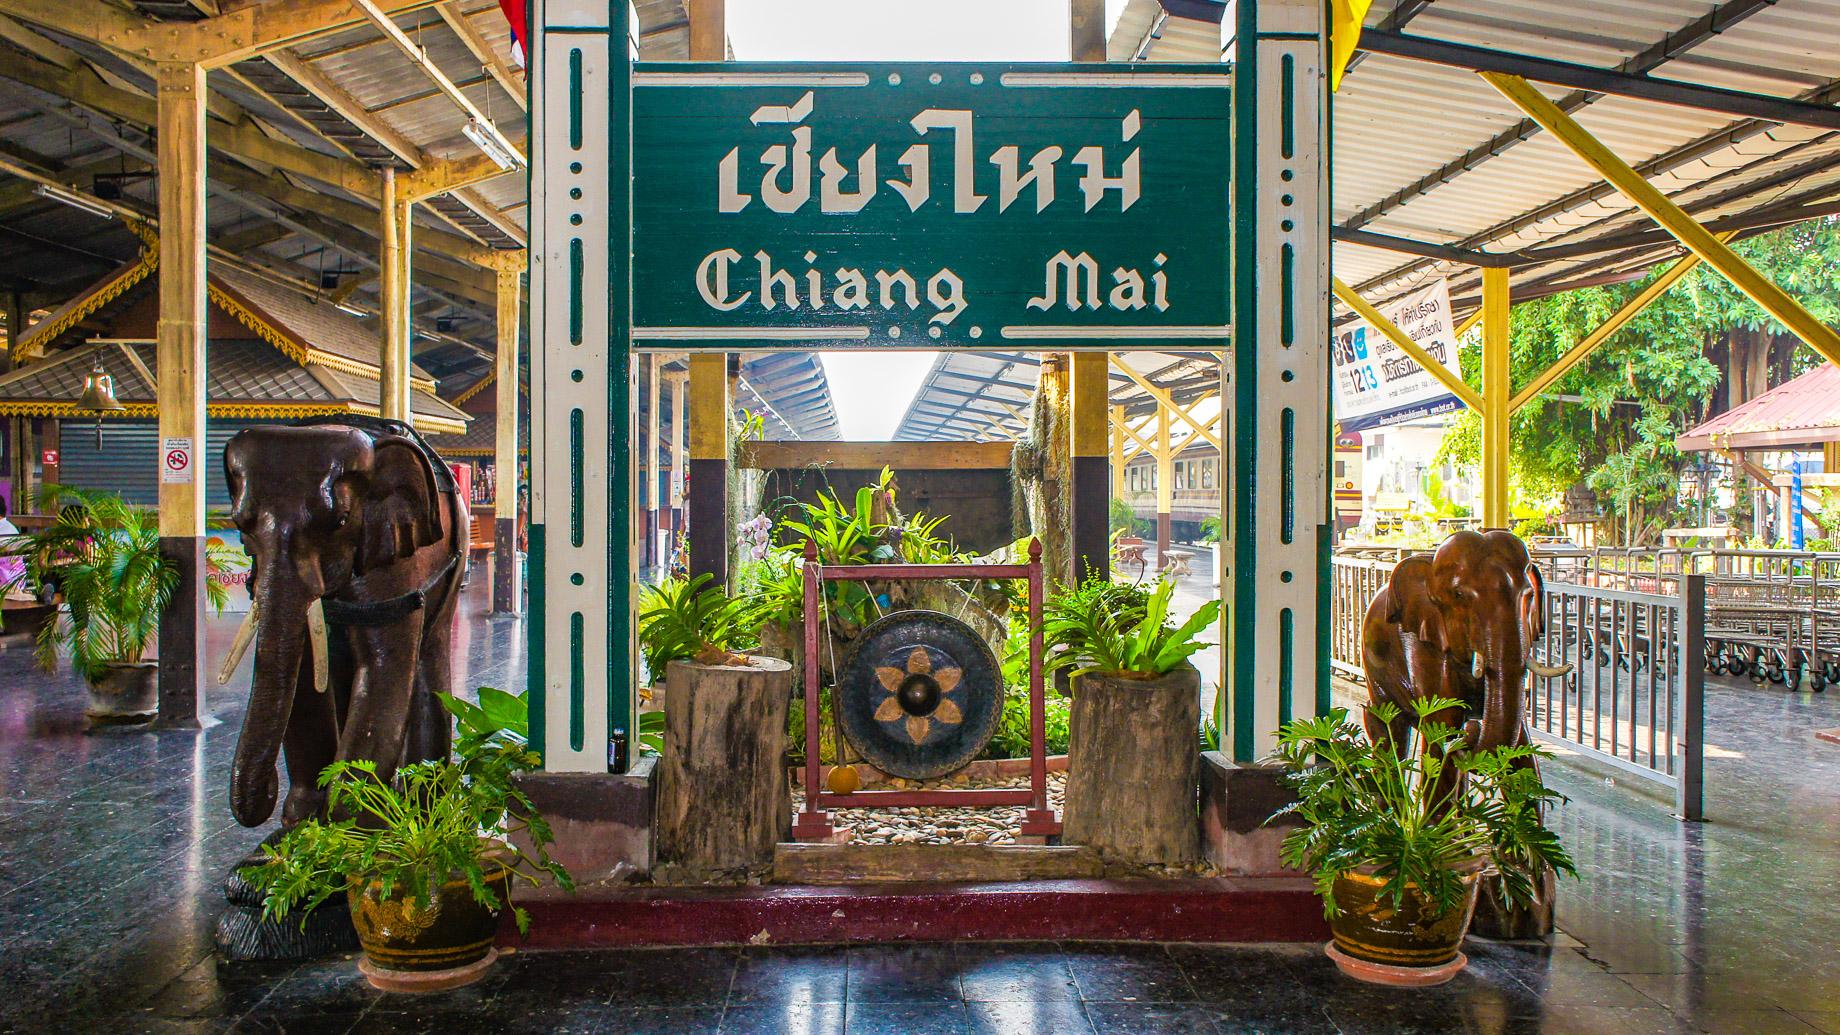 Ankunft am Bahnhof von Chiang Mai